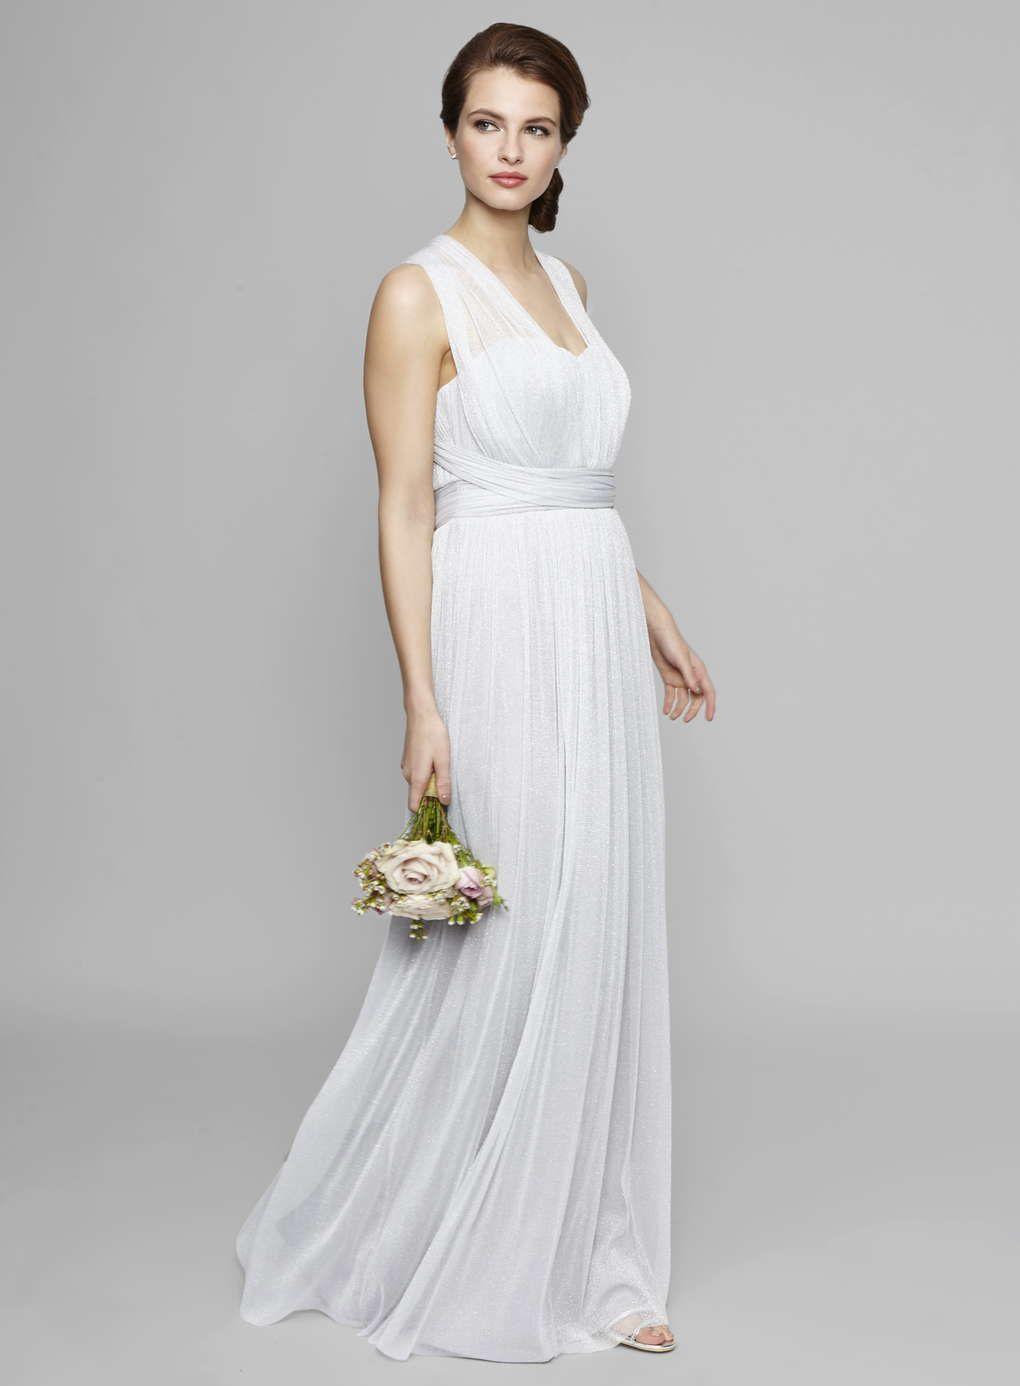 Grey emily glitter bridesmaid dress httpweddingheart grey emily glitter bridesmaid dress httpweddingheart ombrellifo Gallery